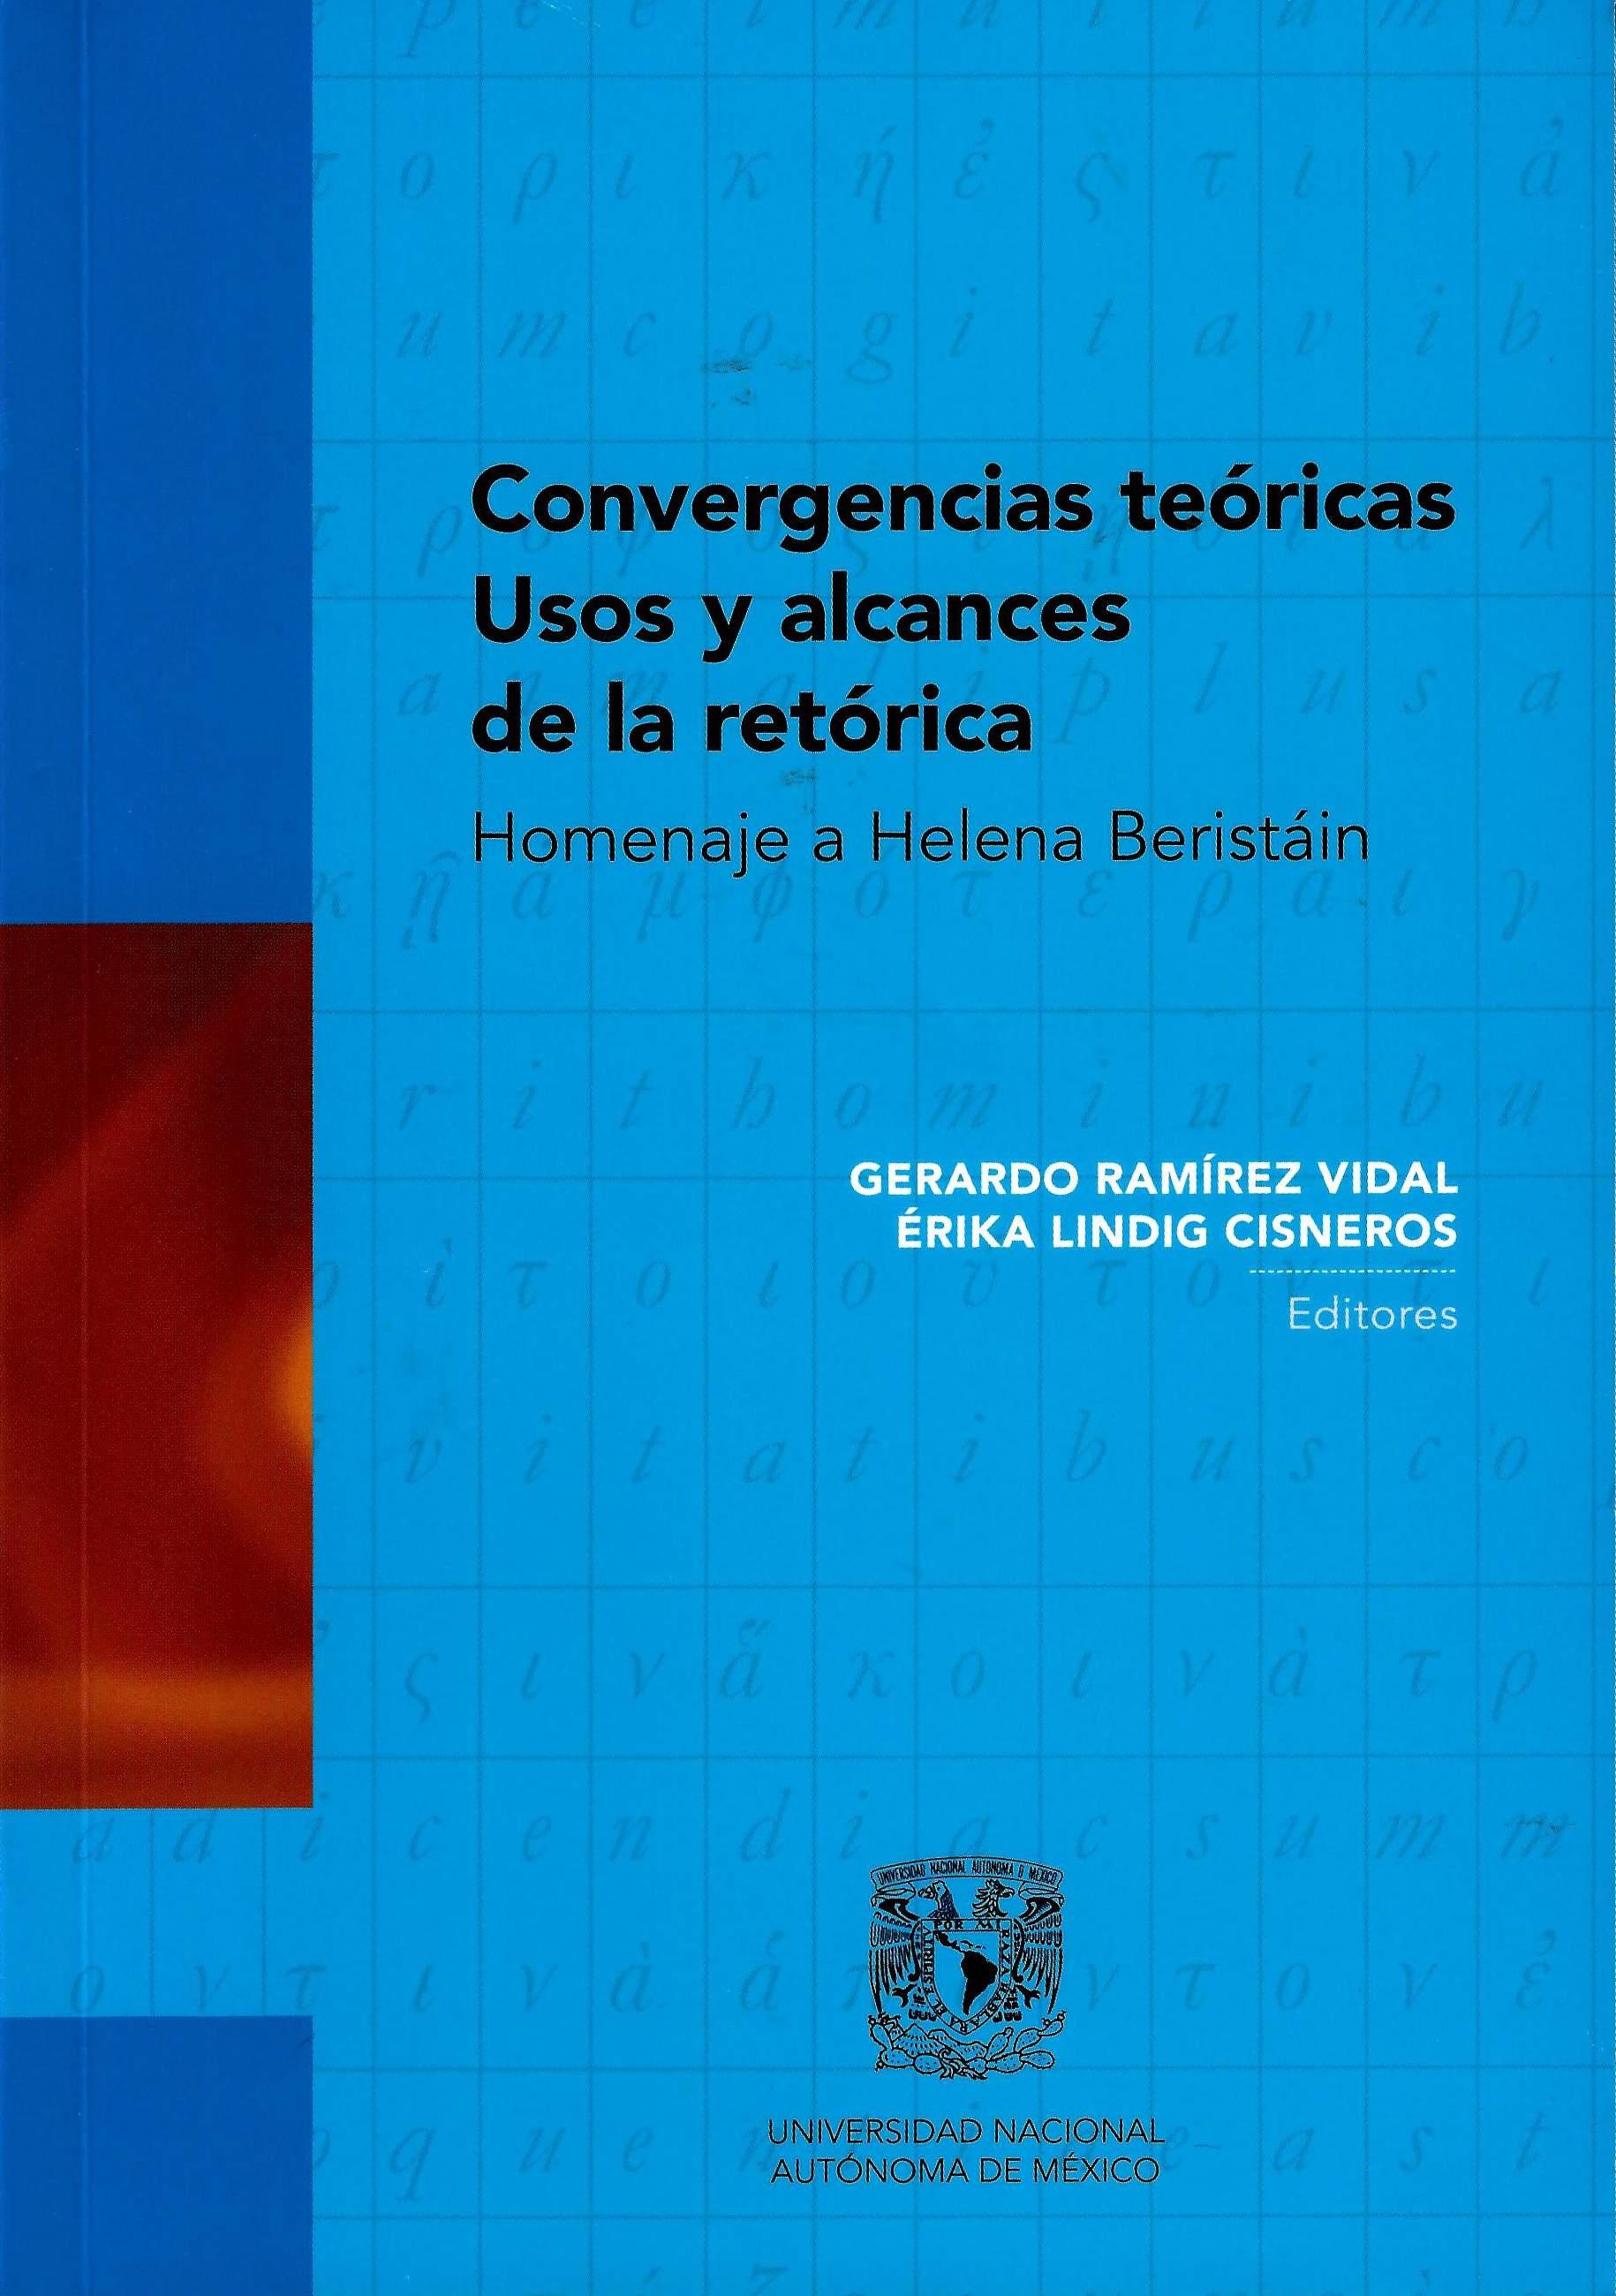 Convergencias teóricas. Usos y alcances de la retórica Homenaje a Helena Beristáin